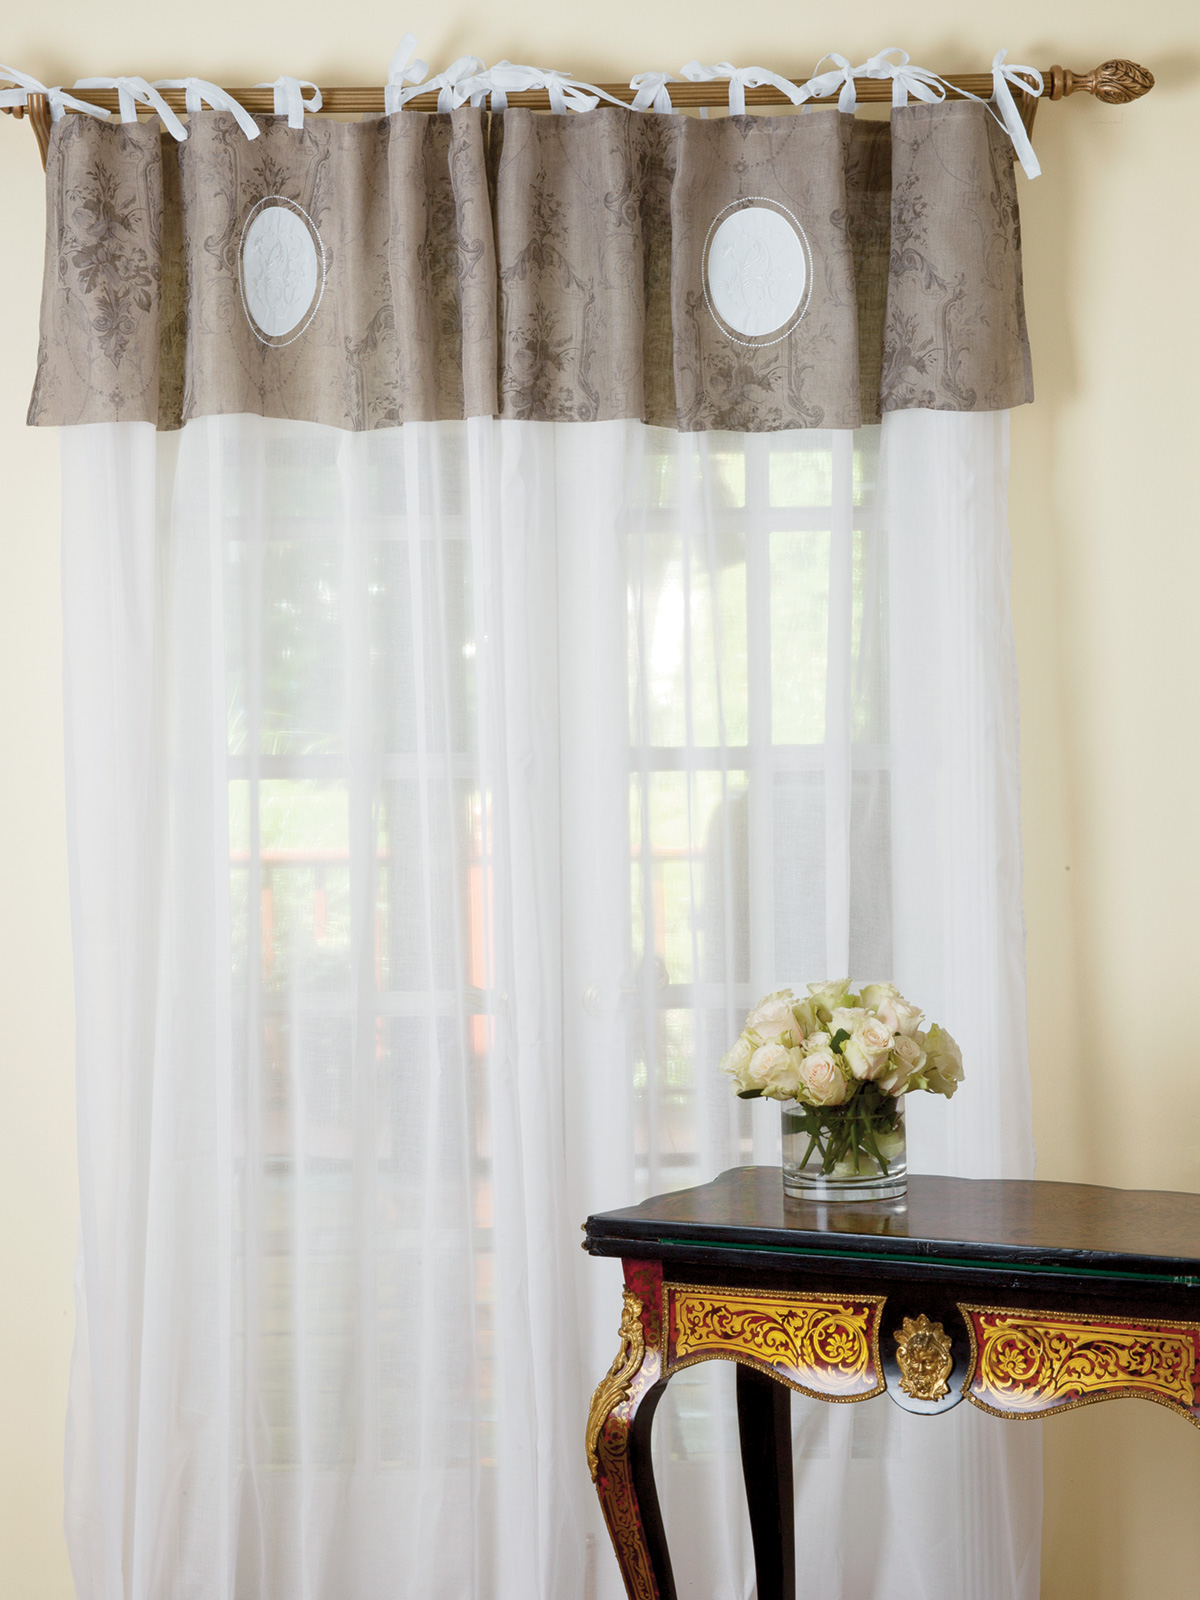 Curtain_GrandPrix_11556.jpg